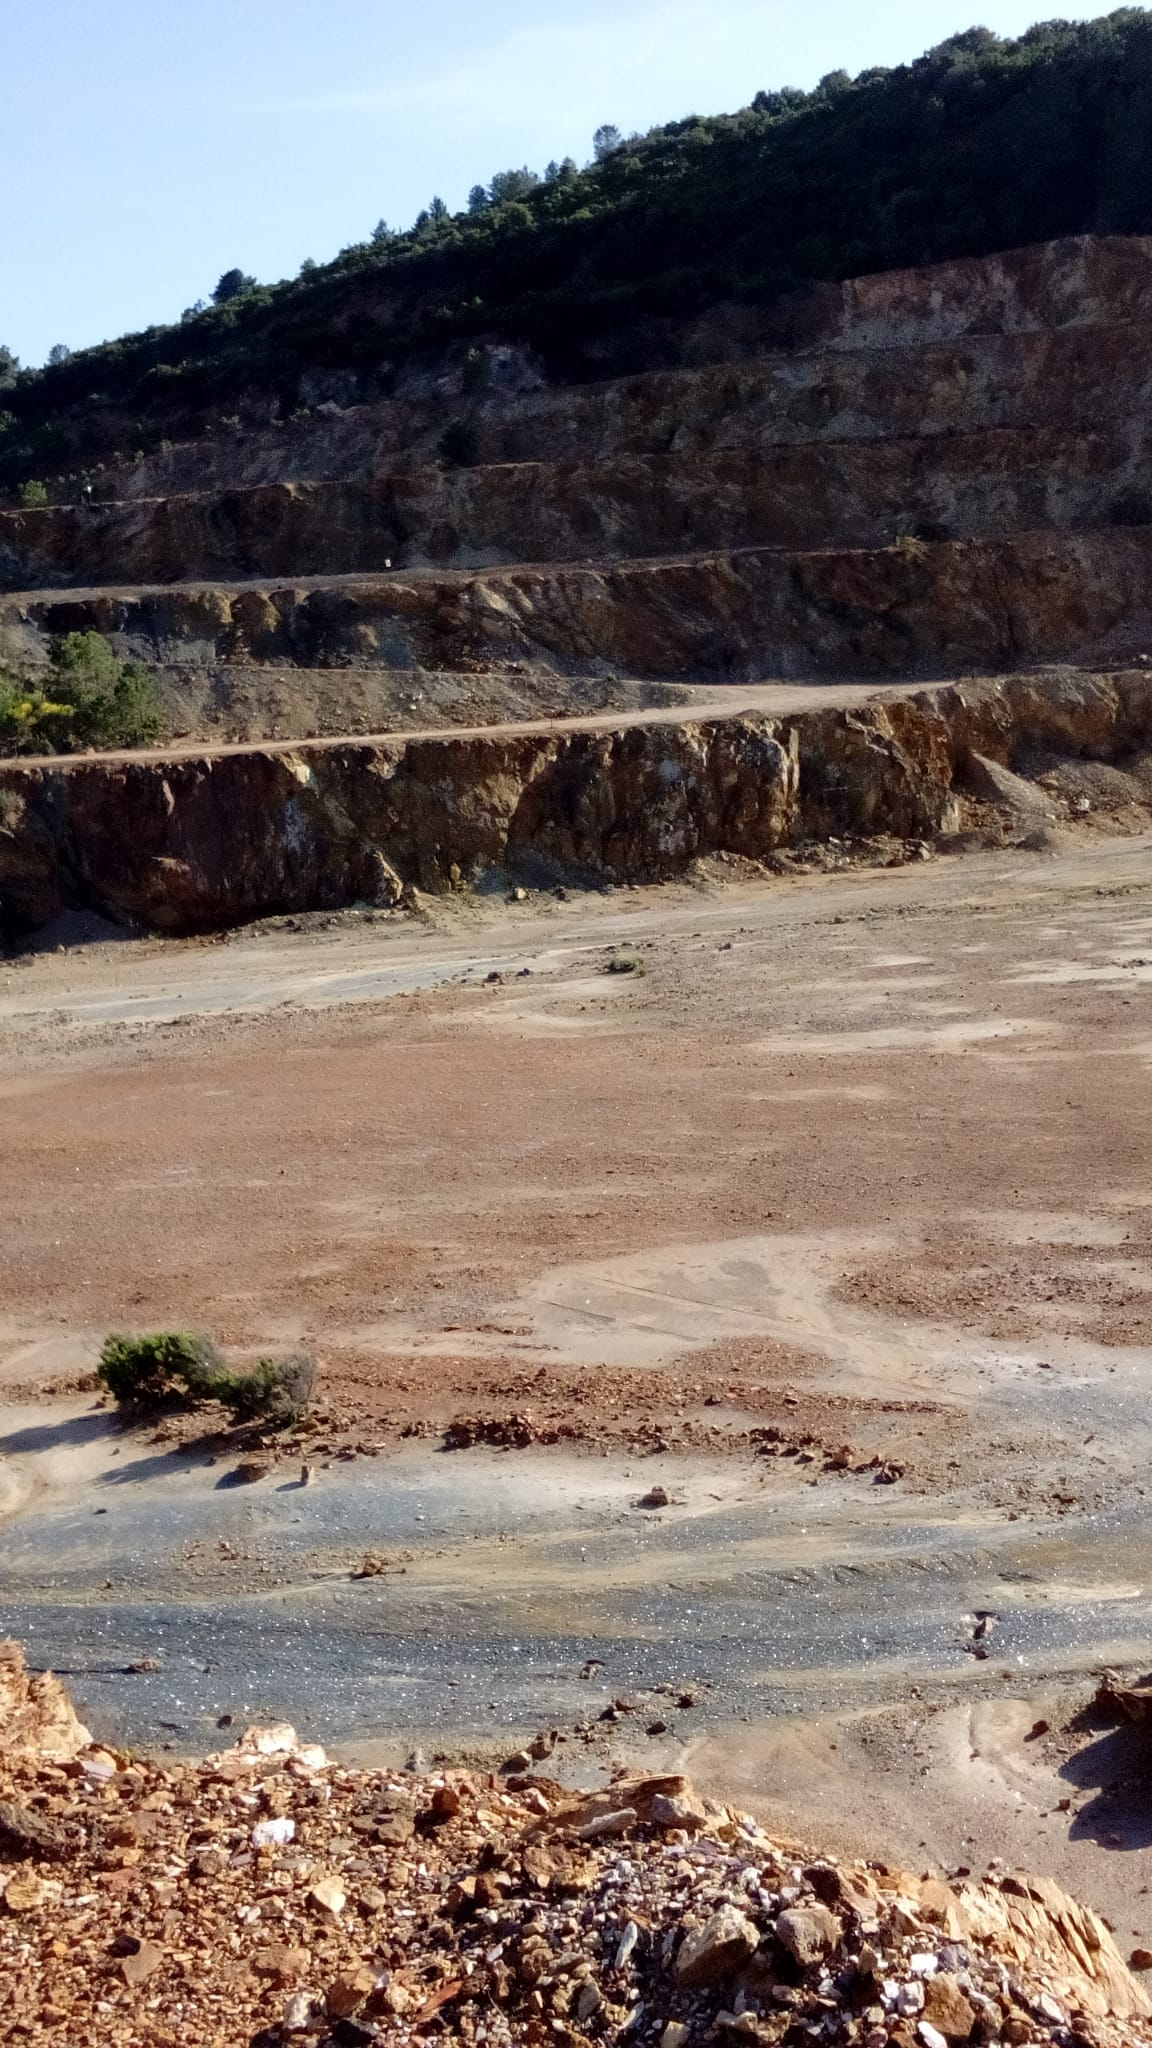 Cava parco Minerario Rio Marina